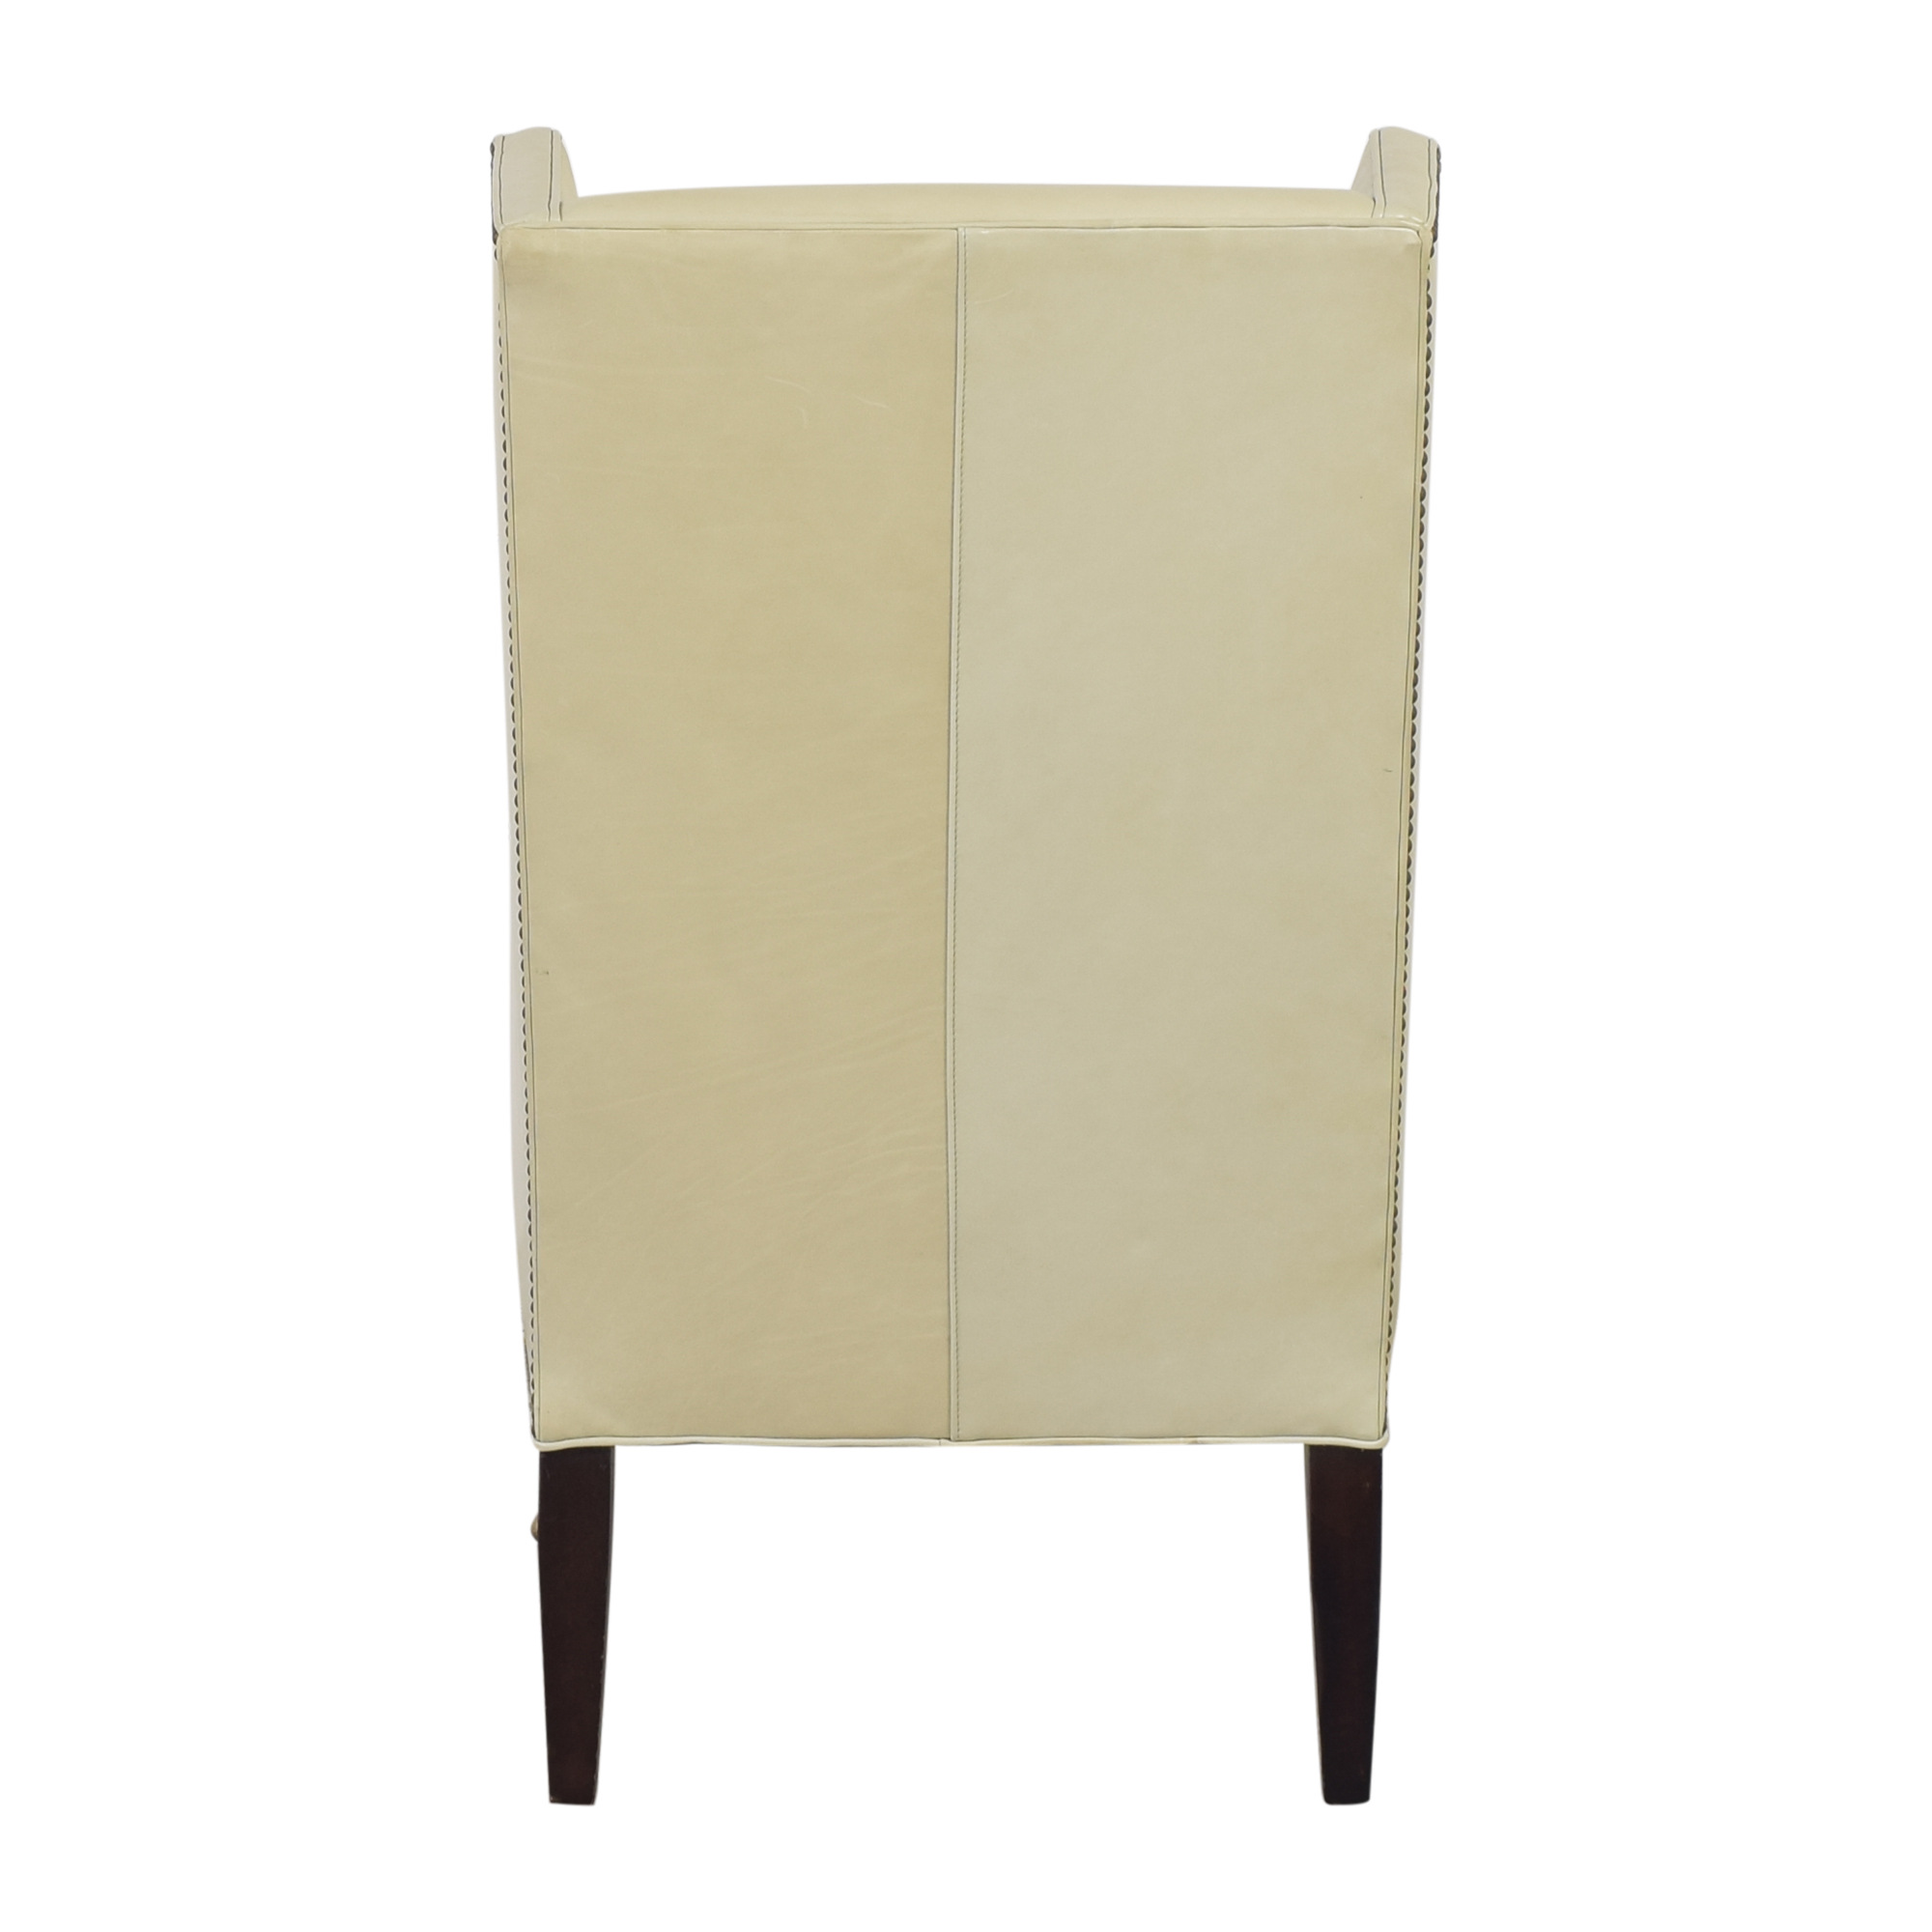 Crate & Barrel Crate & Barrel Wingback Chair price